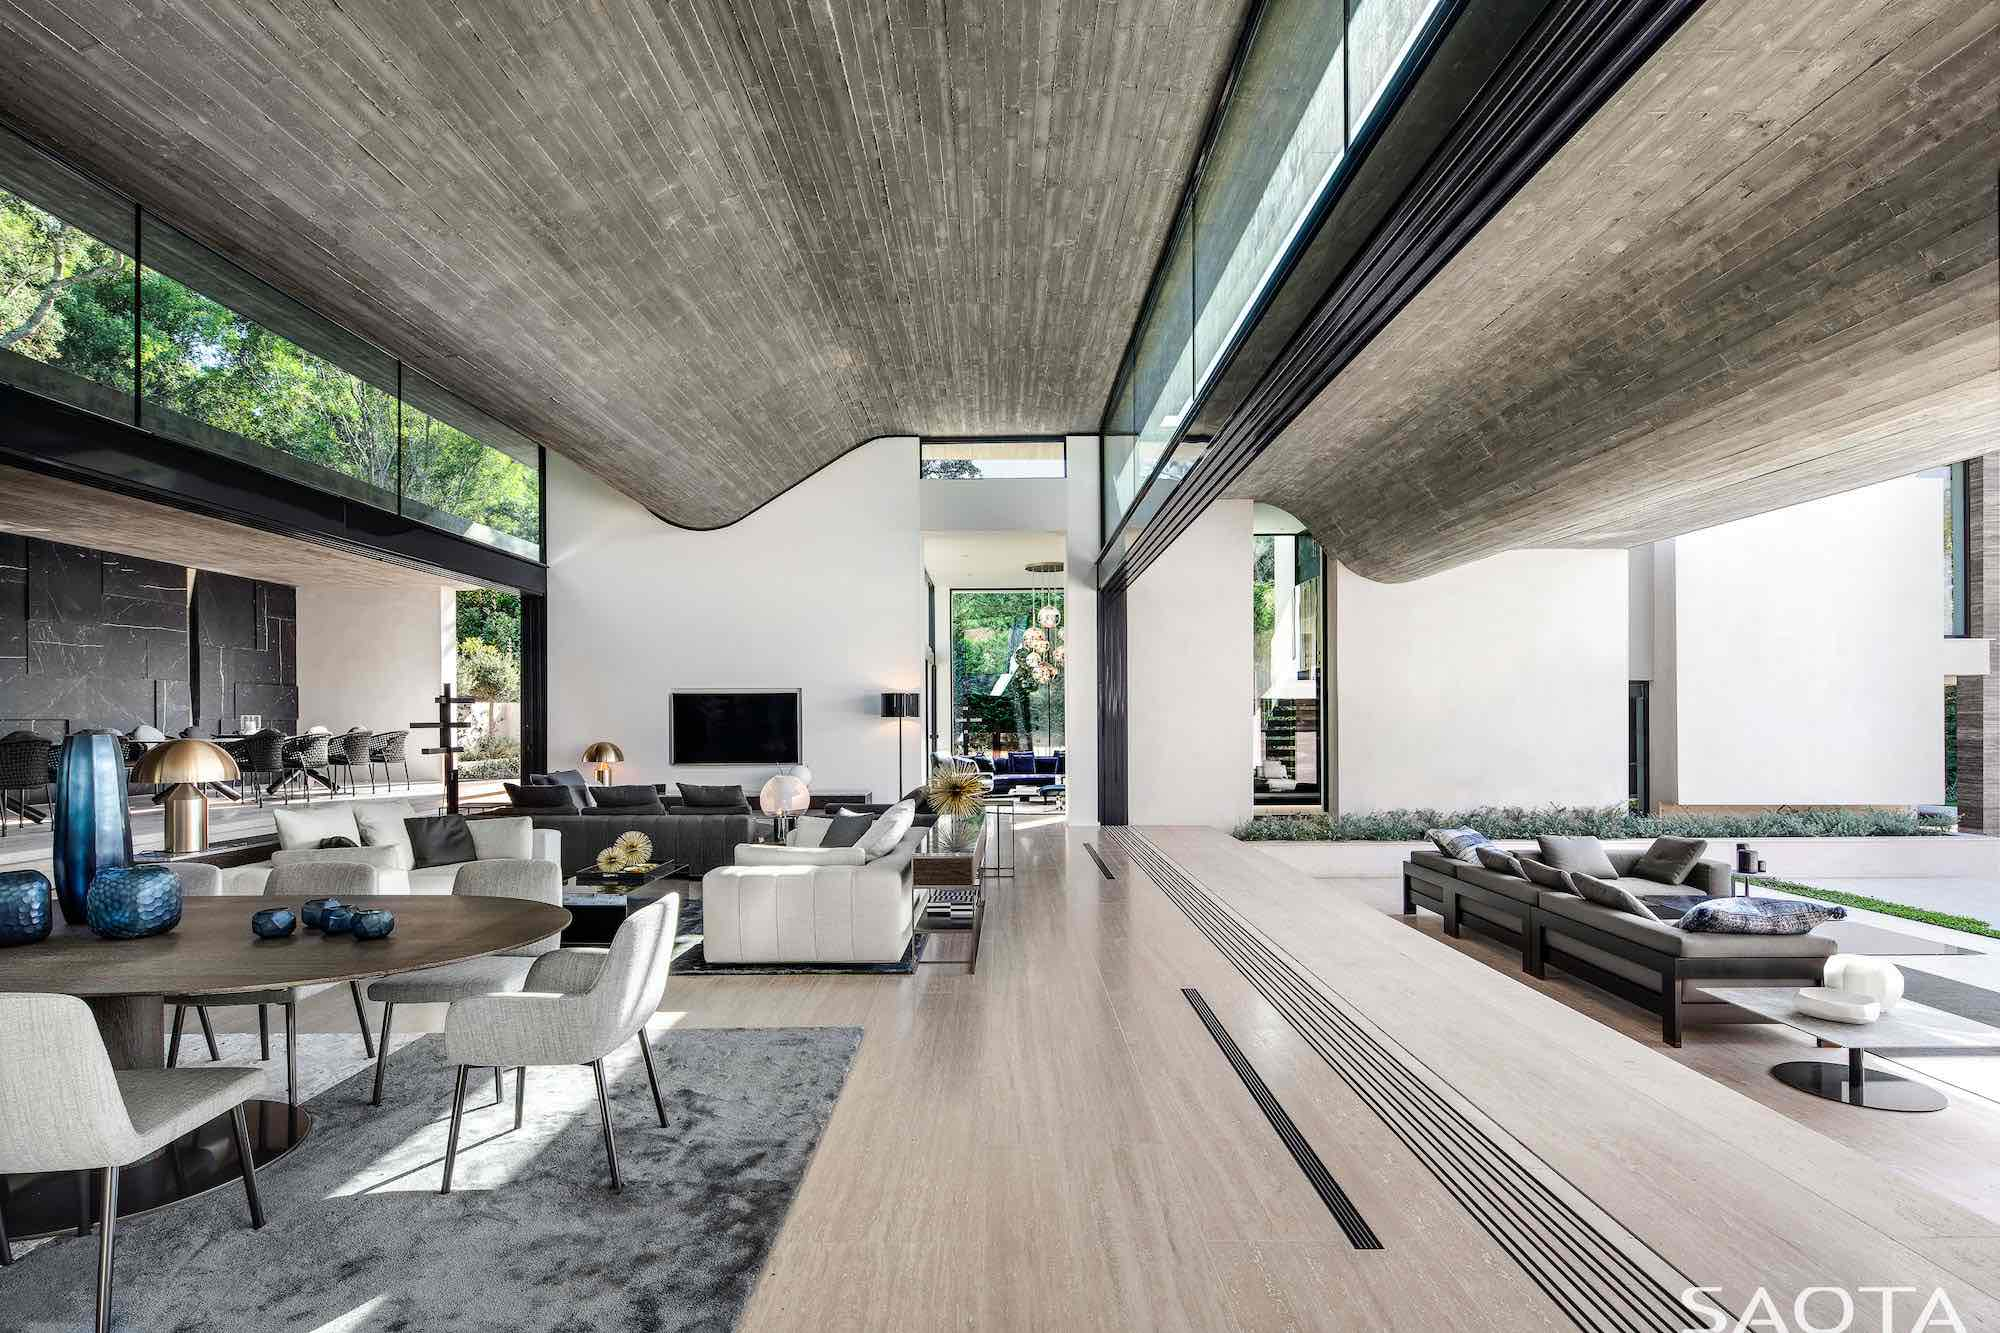 living area with a spectacular view toward garden